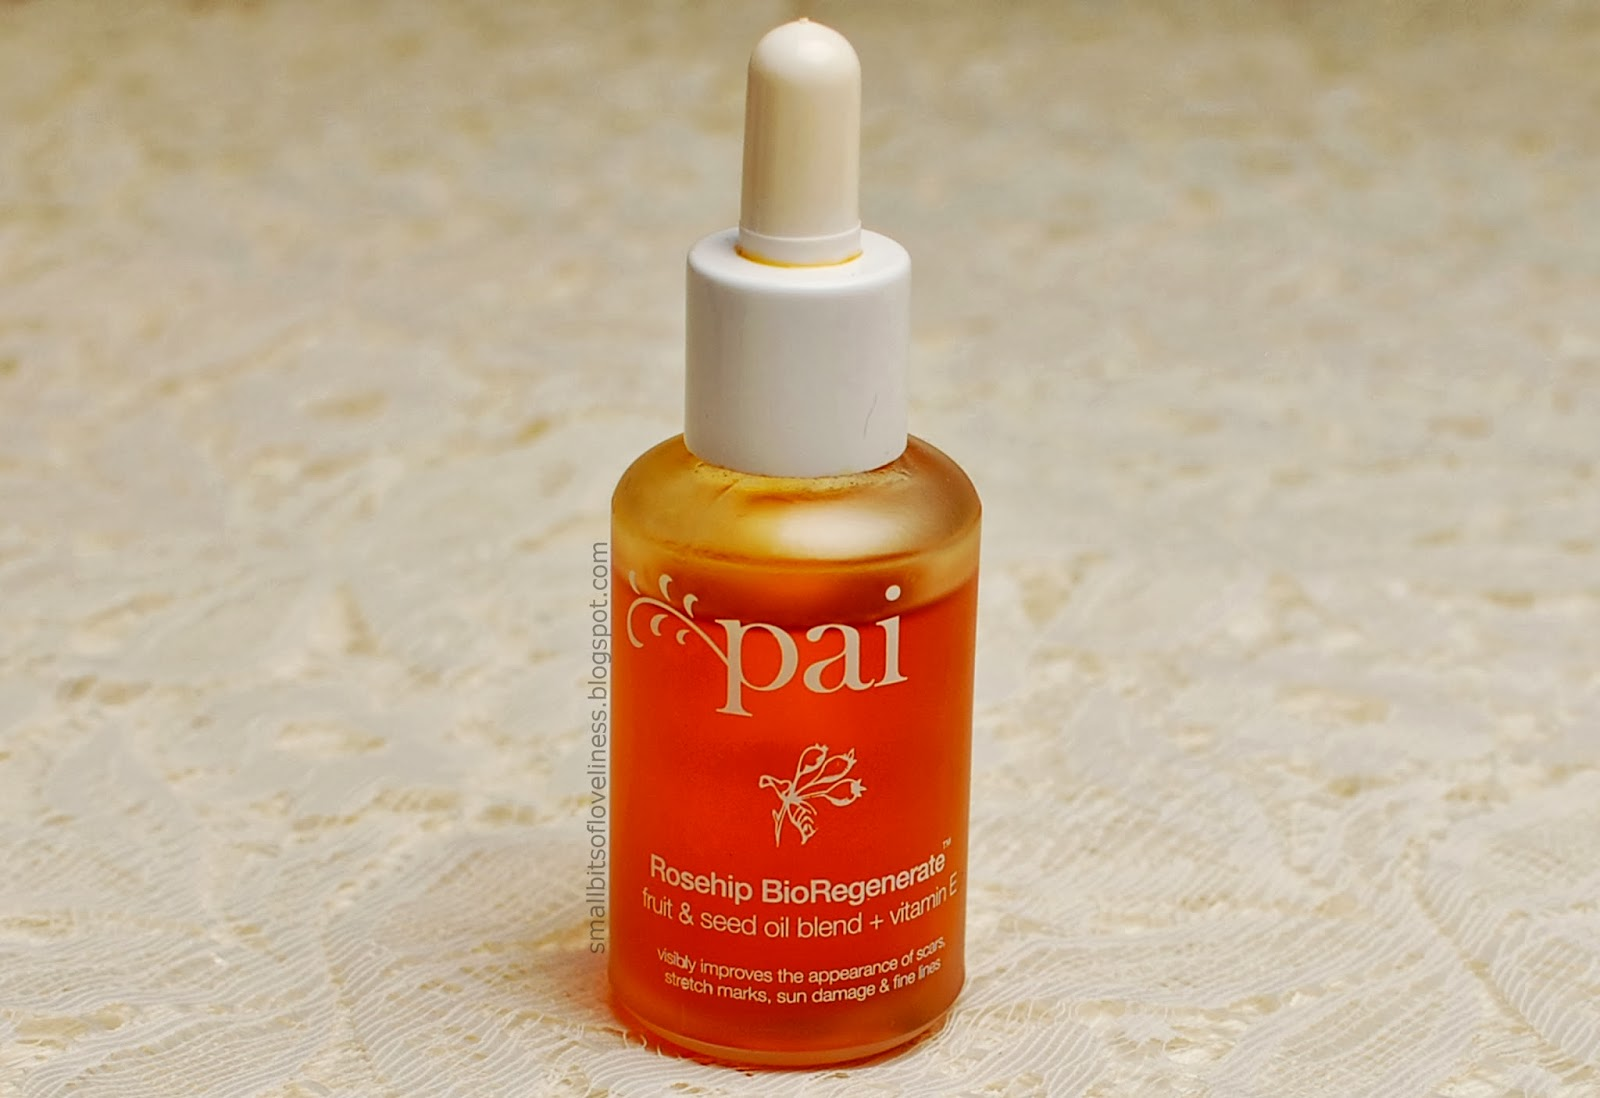 Pai Rosehip BioRegenerate Fruit & Seed Oil Blend